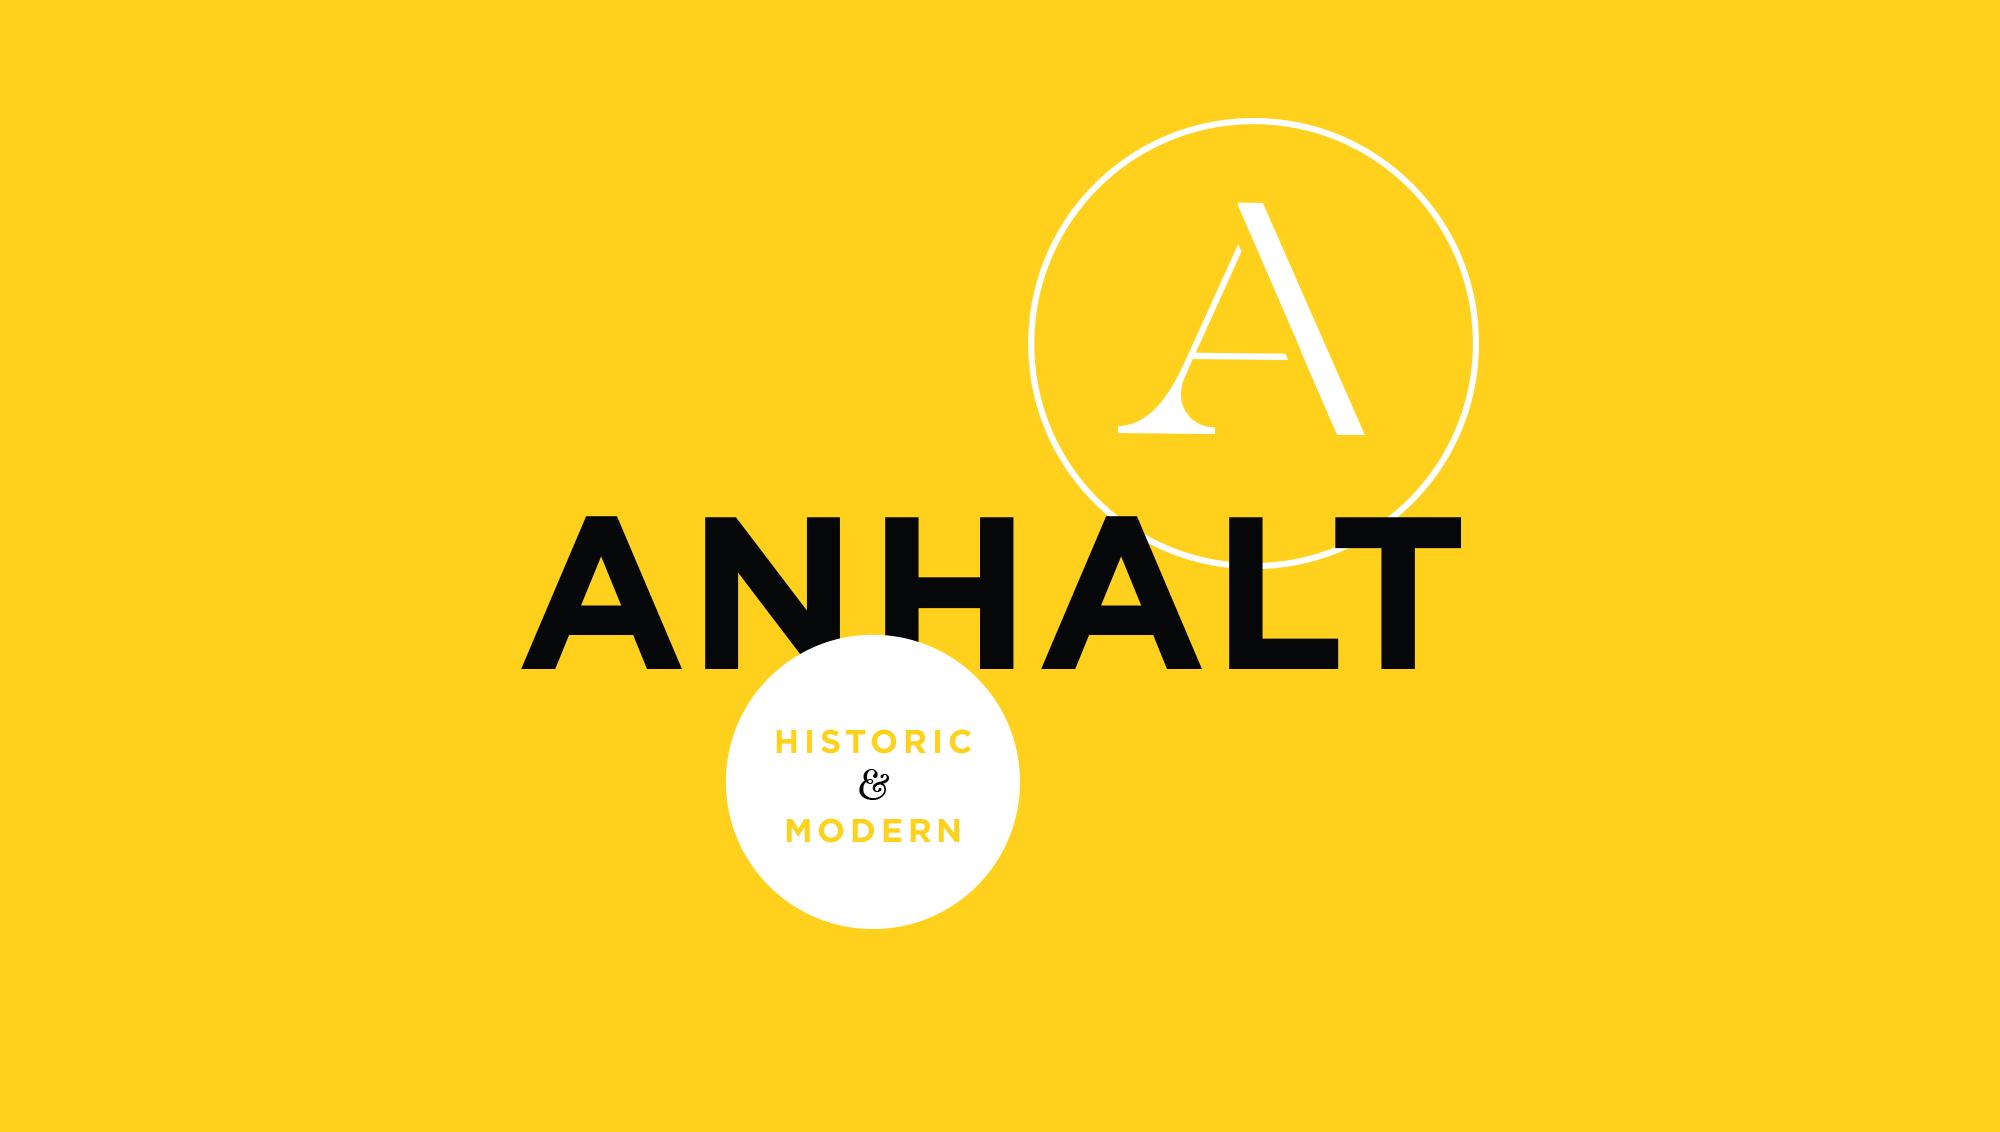 Anhalt Historic & Modern